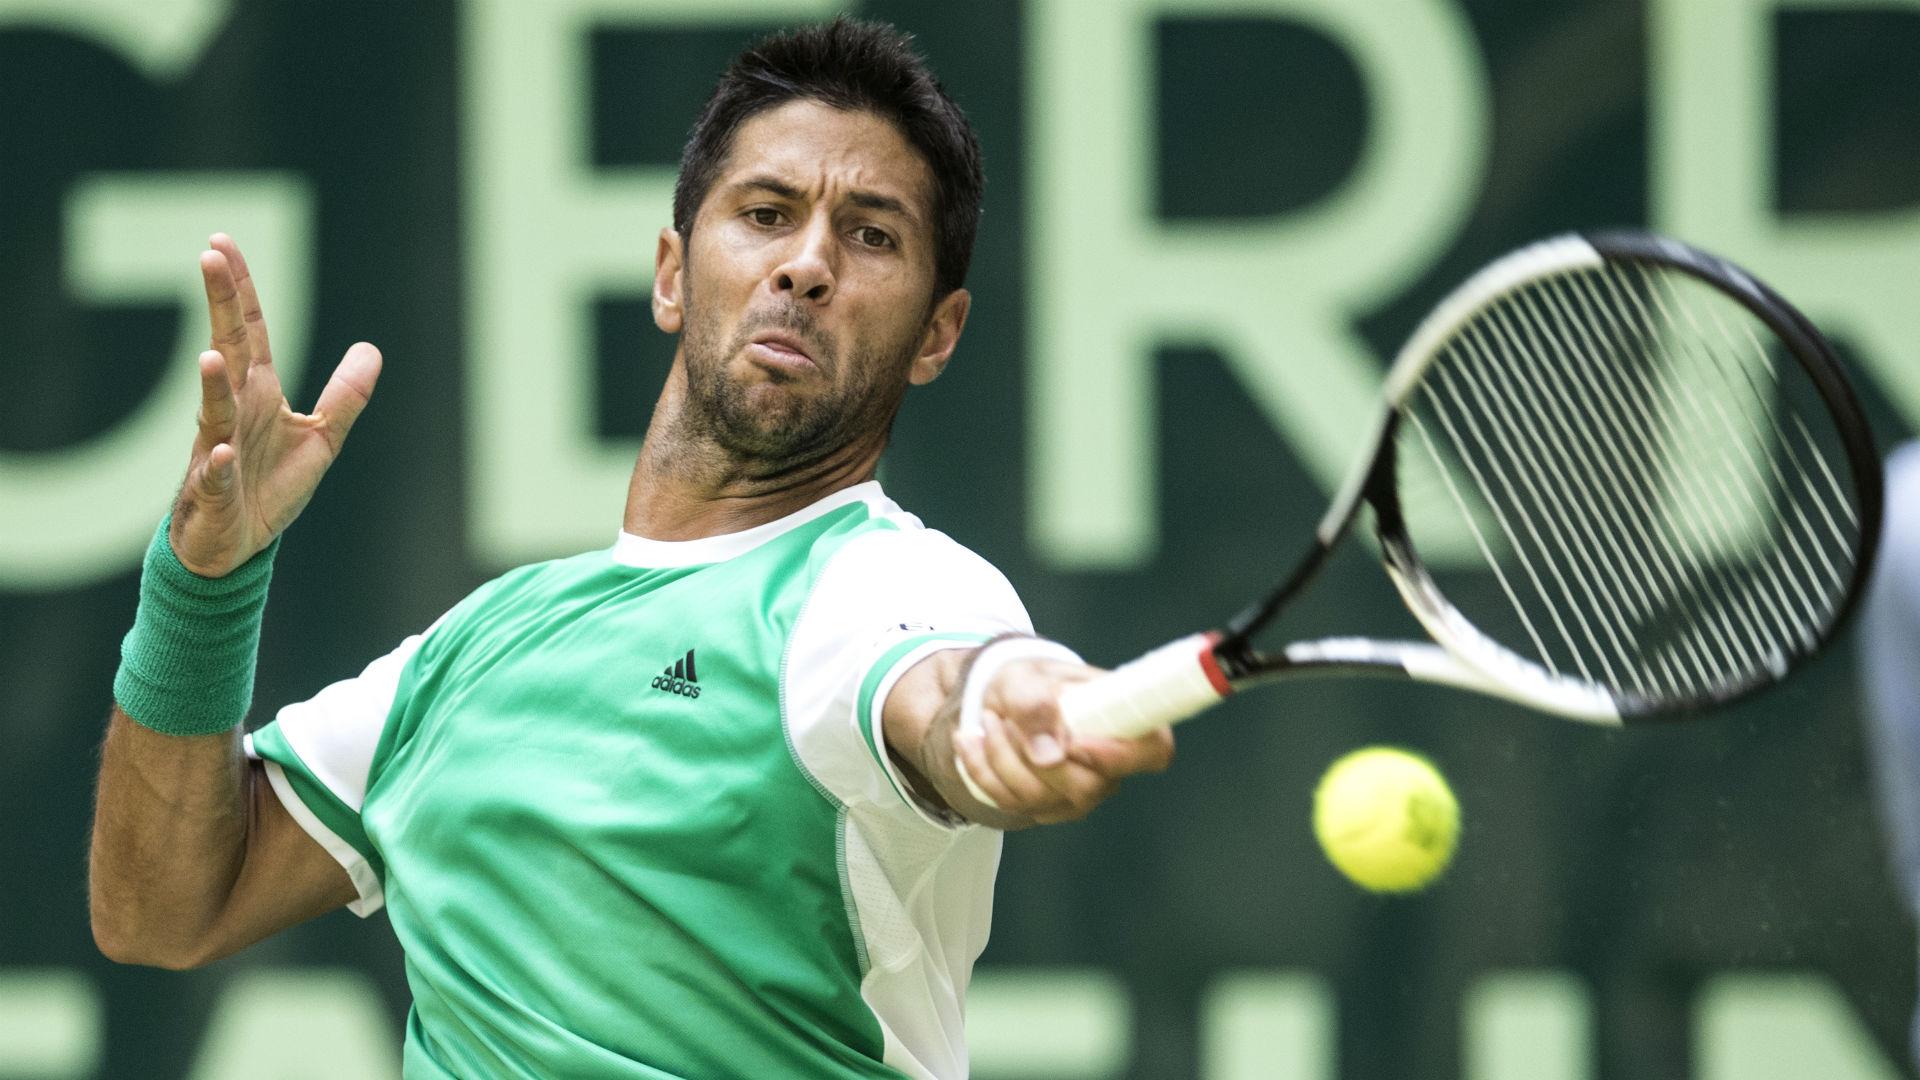 Очередной топ-теннисист снялся с US Open - фото